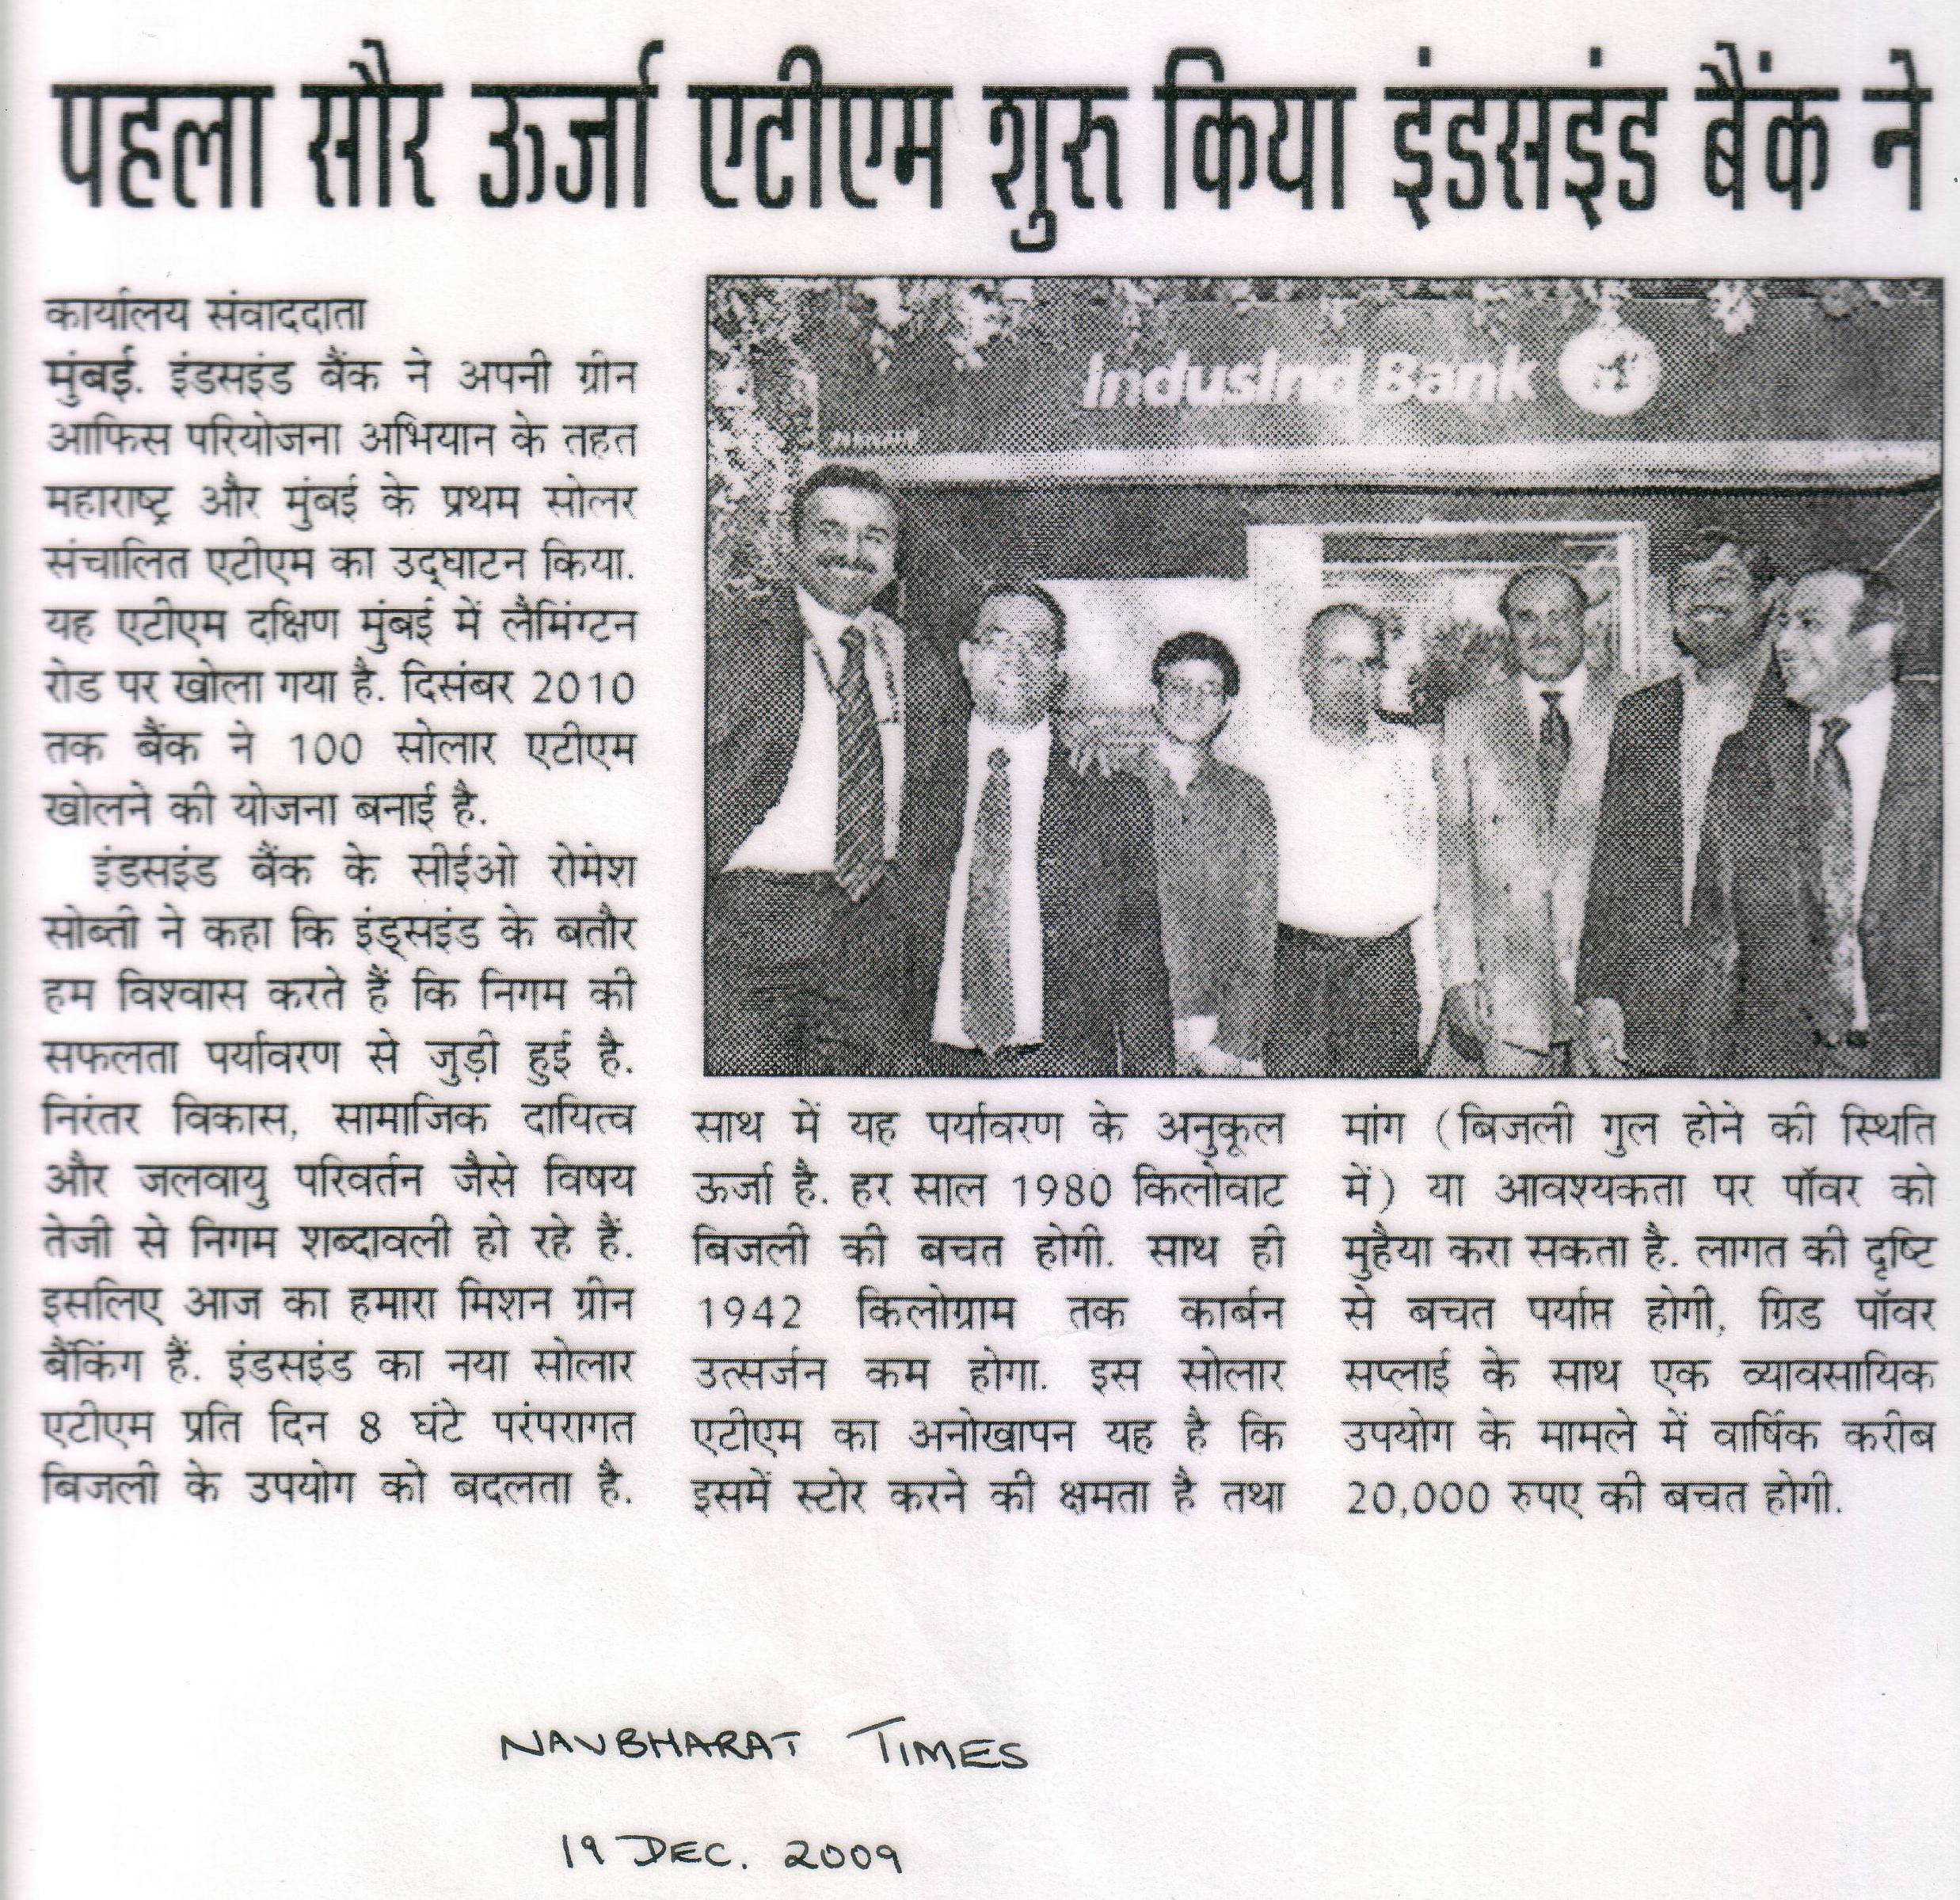 Navbharat Times - 19th December, 2009